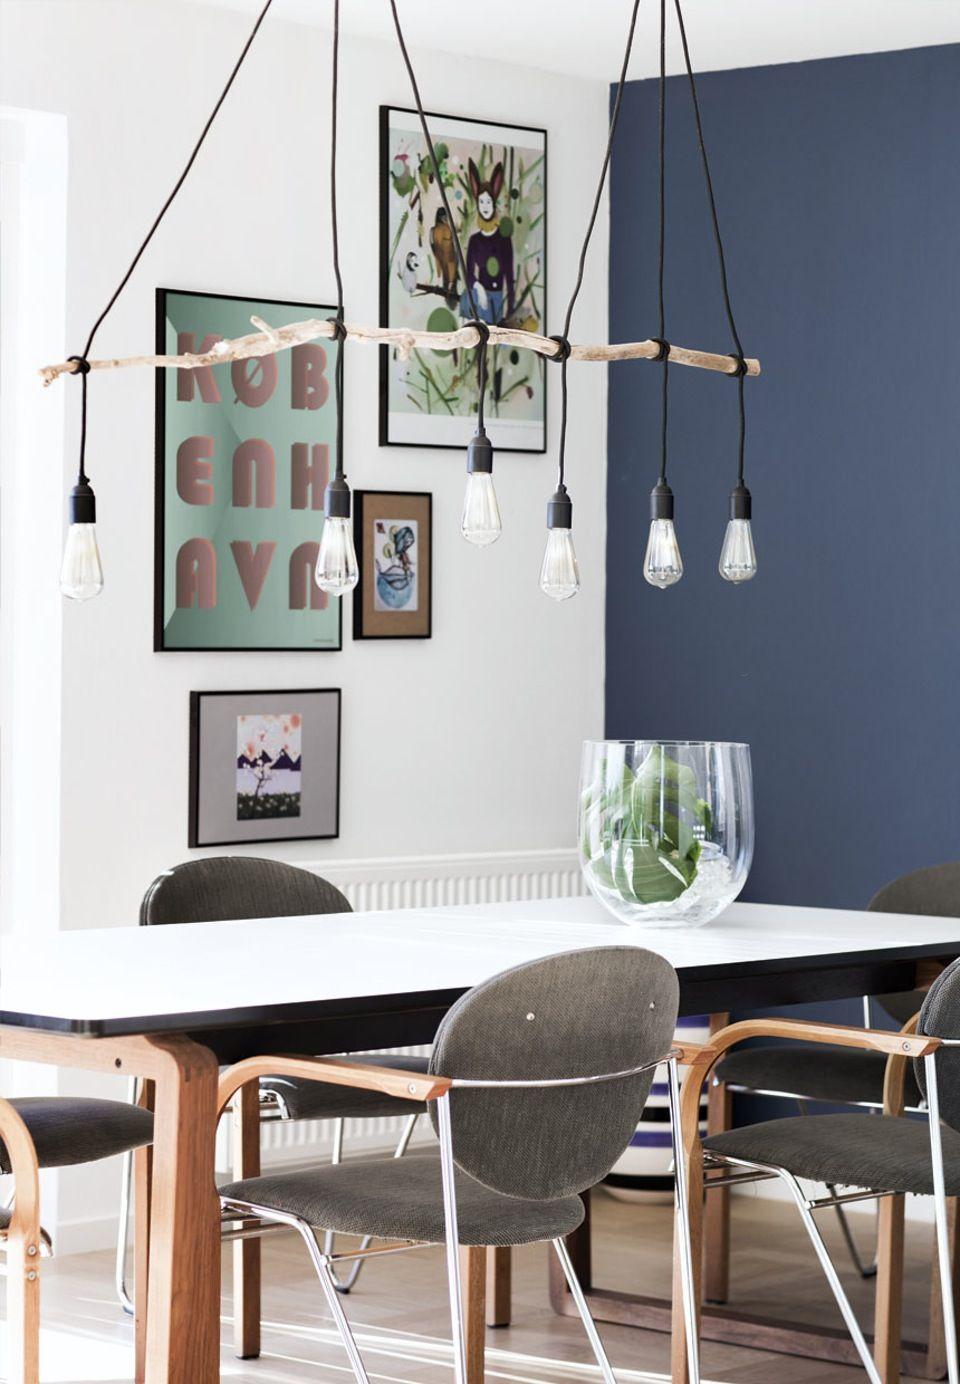 Unik Hjemmelavet lampe over spisebordet   lamper i 2019   Contemporary QM75